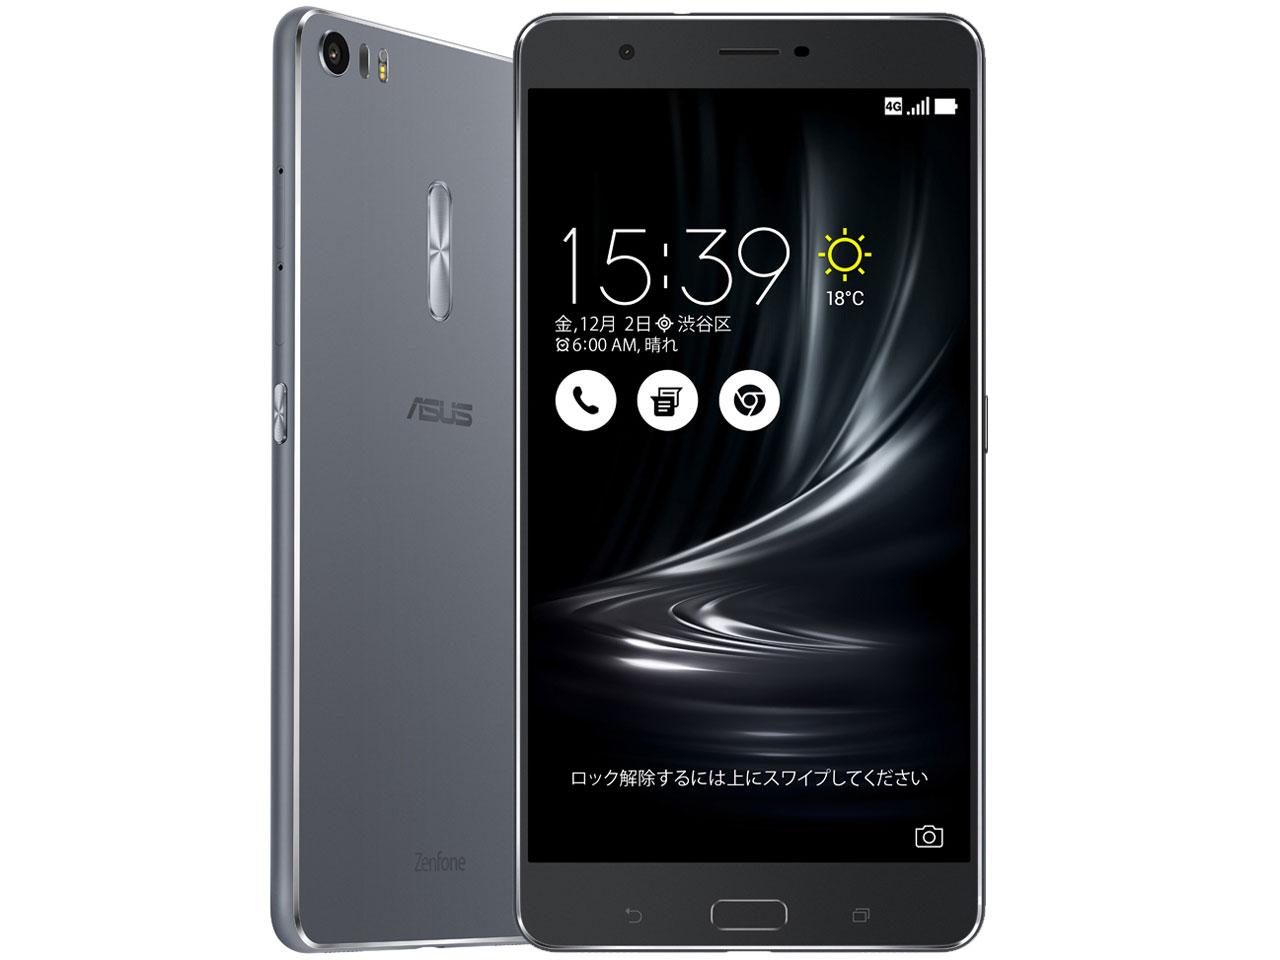 ZenFone 3 Ultra ZU680KL-GY32S4 SIMフリー [グレー] 白ロム 格安スマホ 携帯電話 スマートフォン本体:らいぶshop